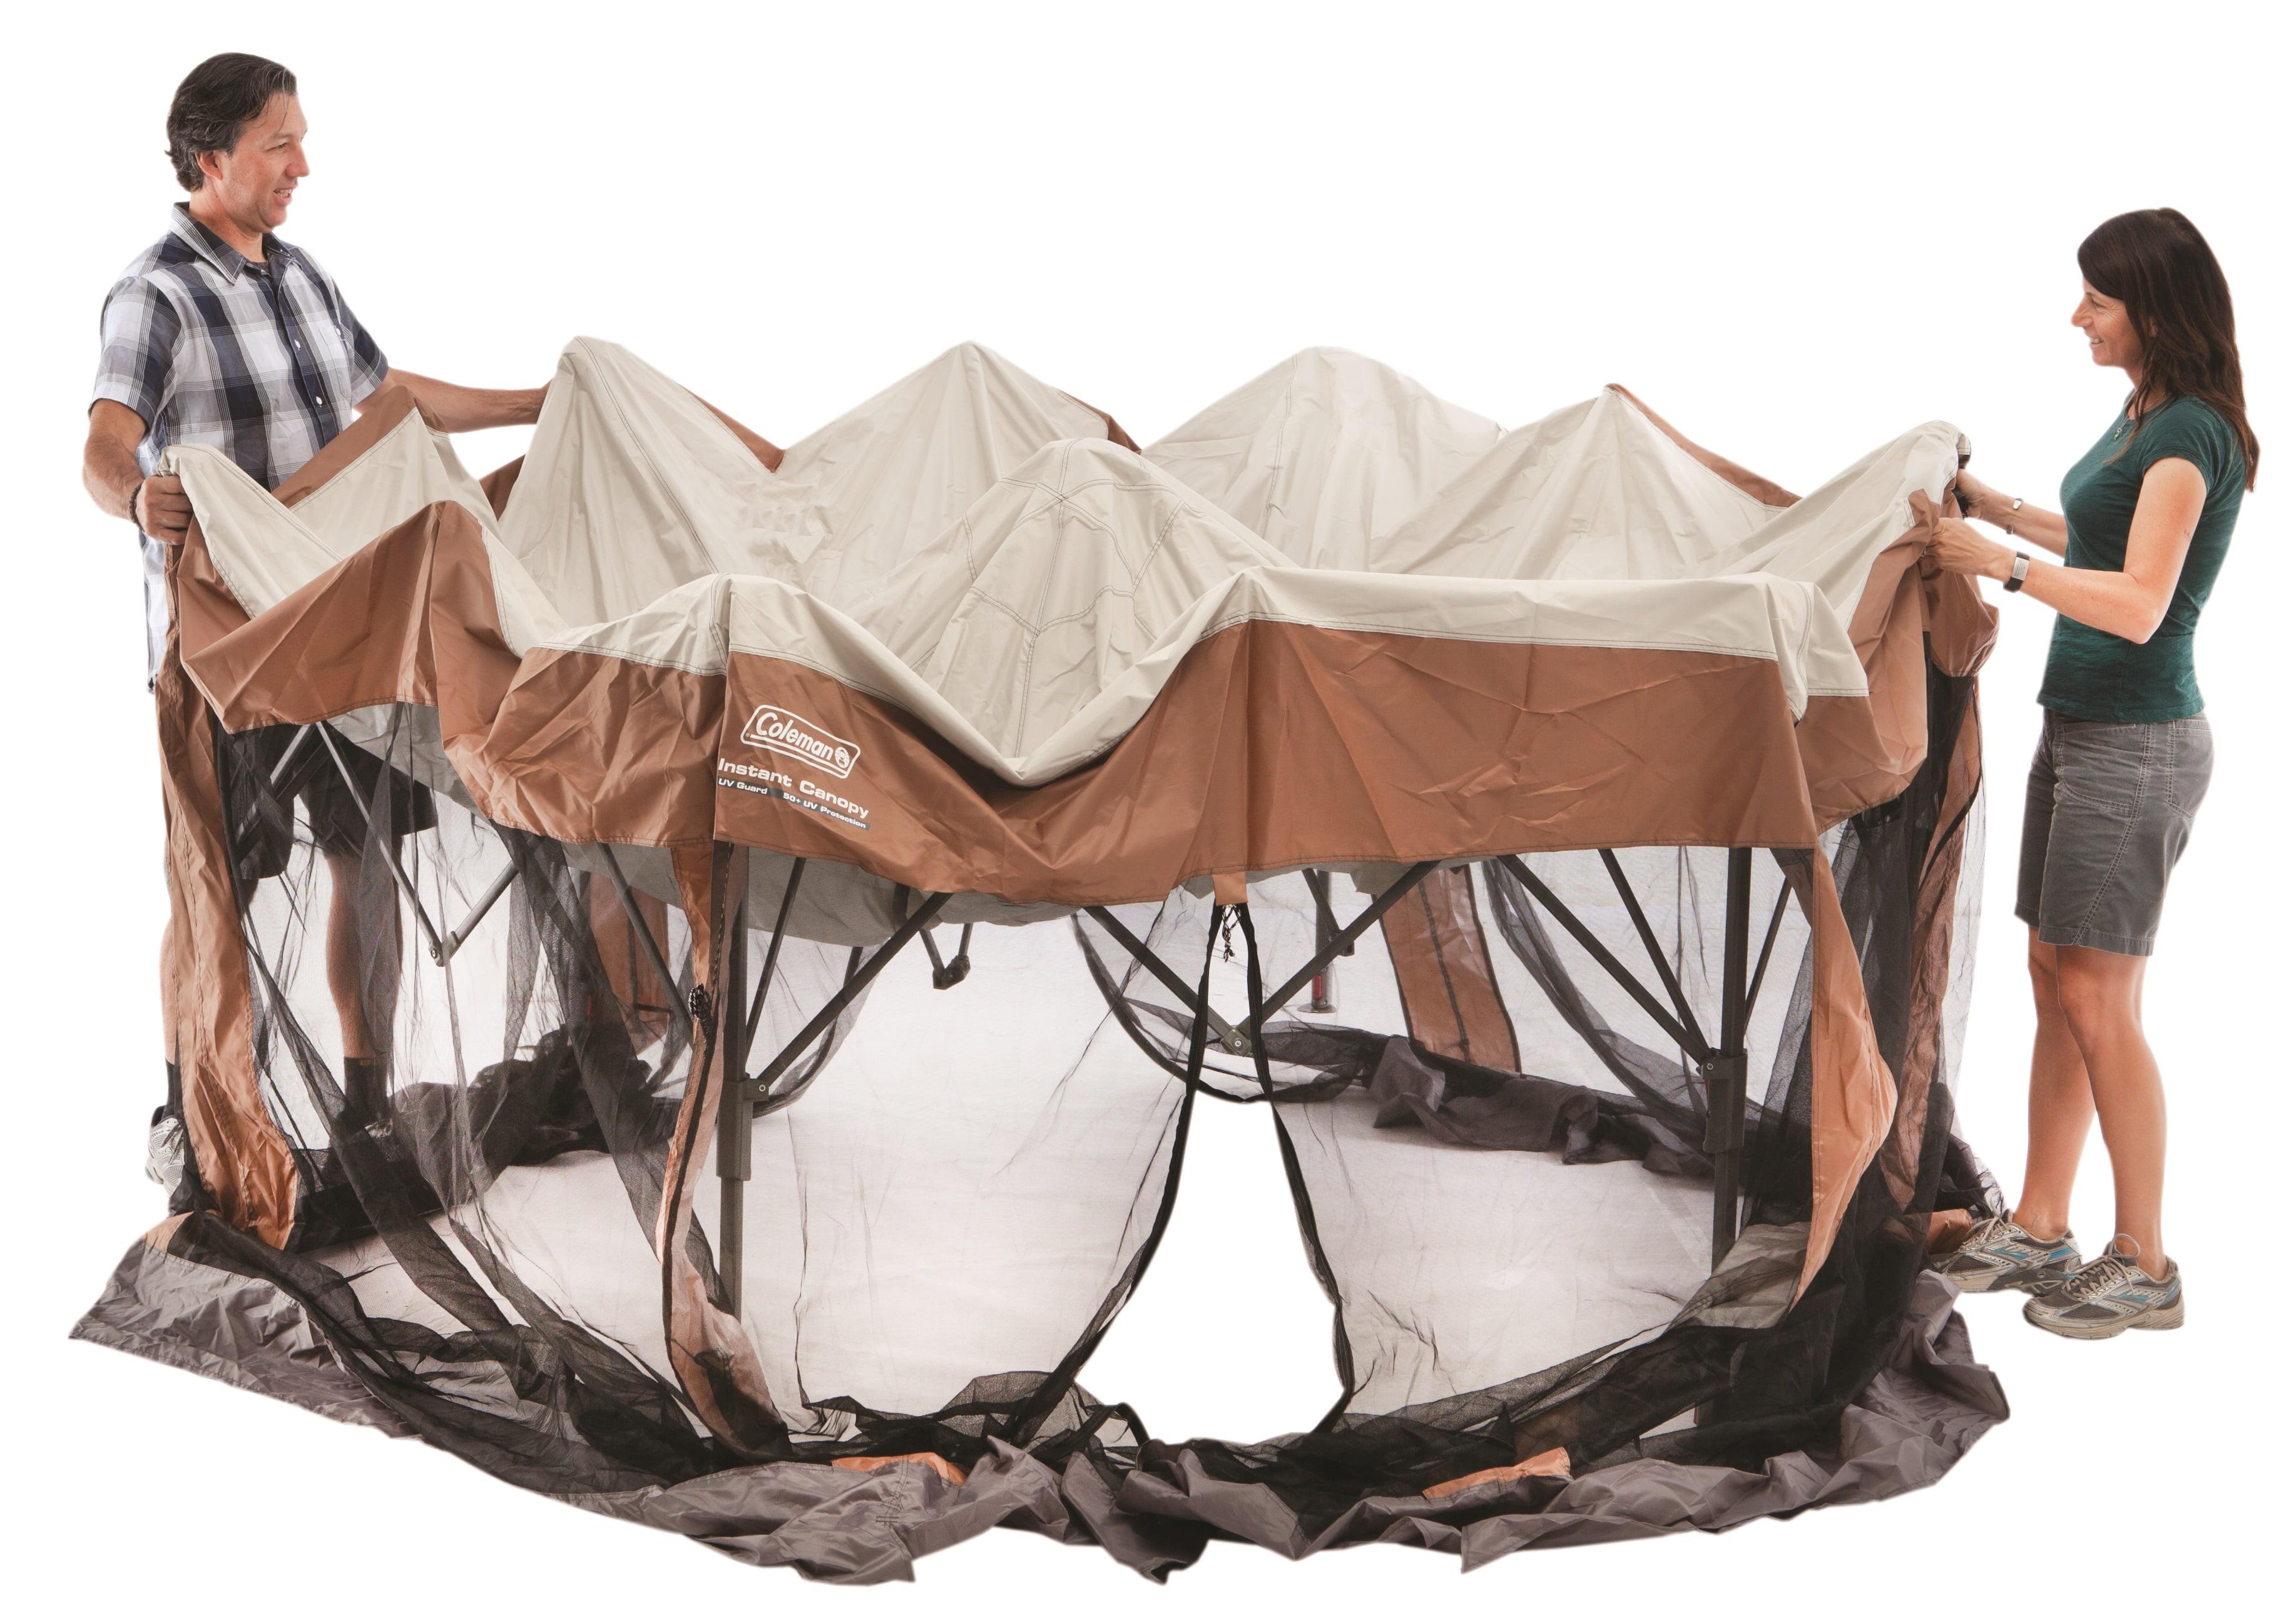 Coleman Screened Auvent Soleil Shade 12x10 tente avec instantanée Setup marron unisexe